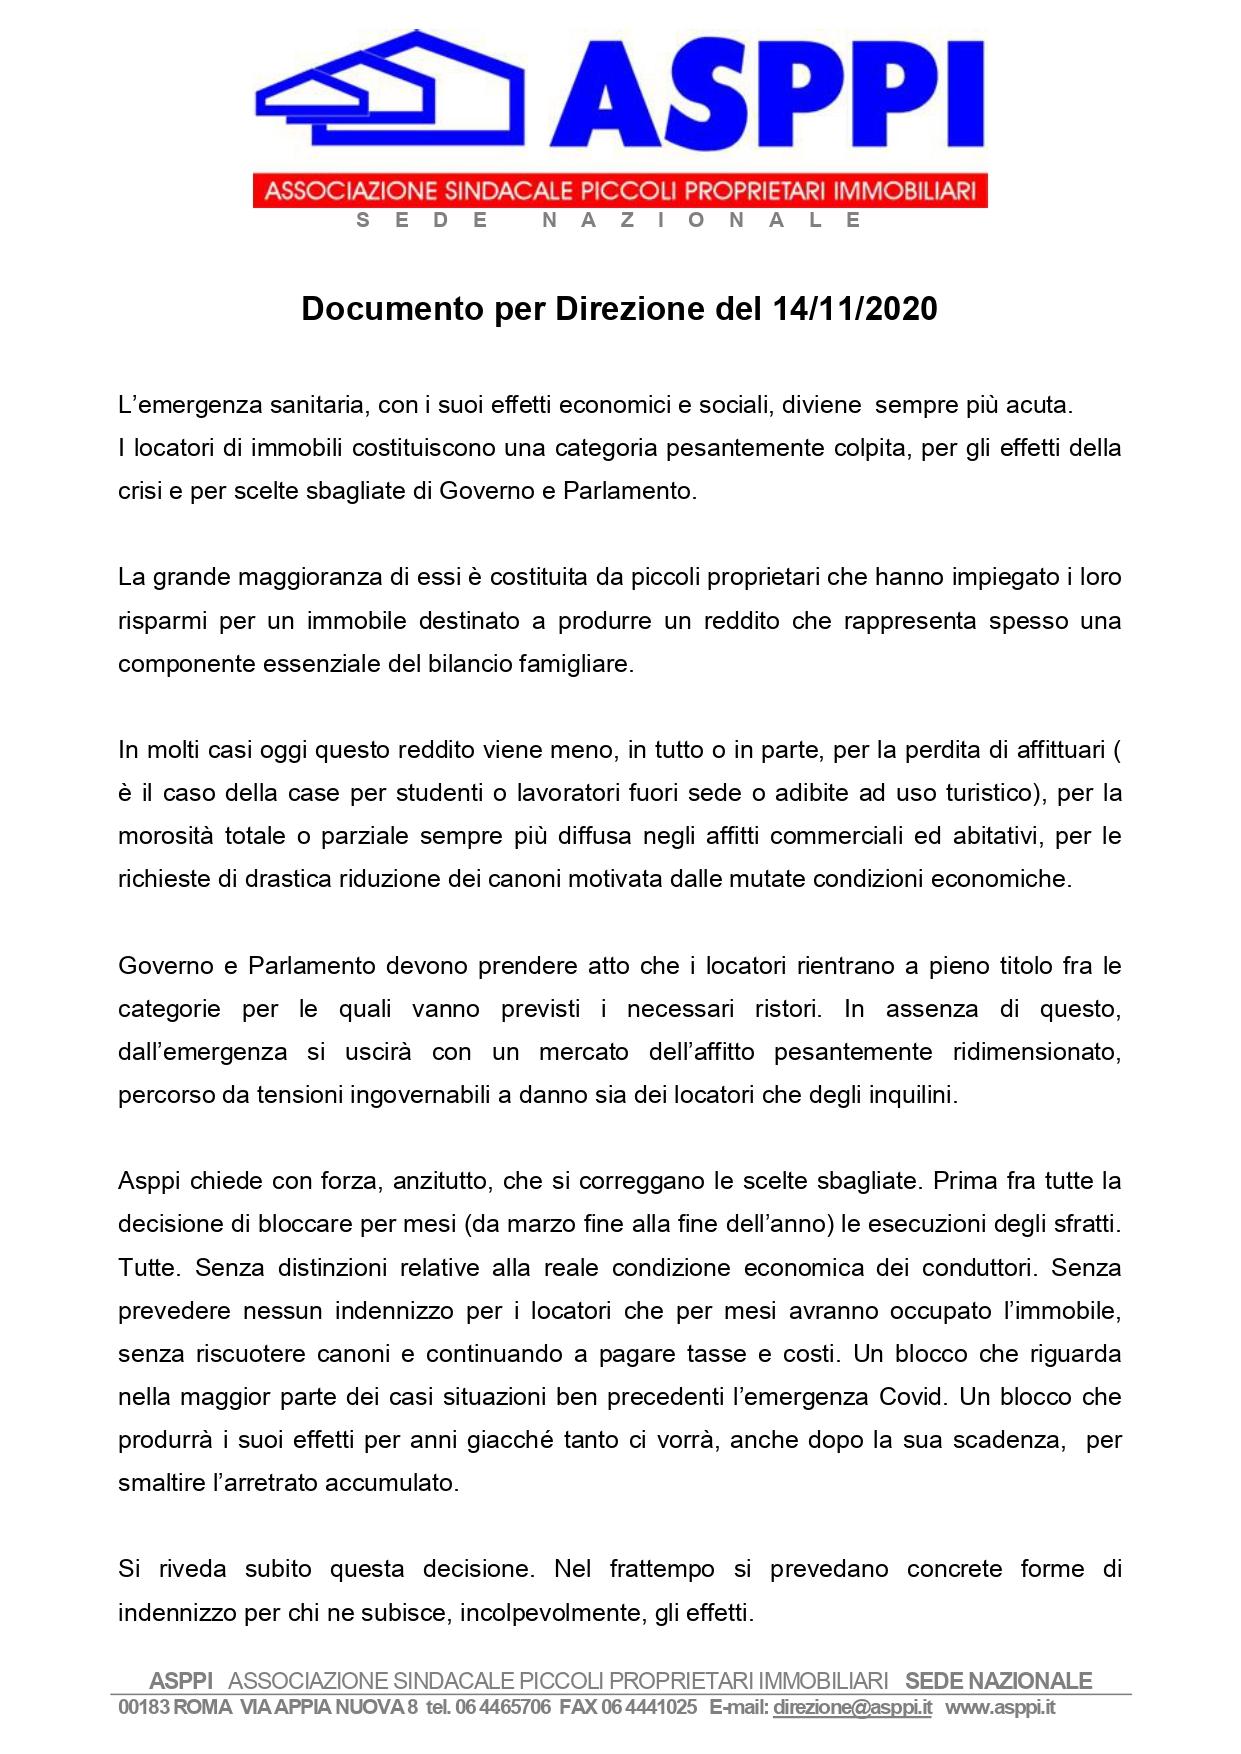 ASPPI: 5 richieste a Governo e Parlamento